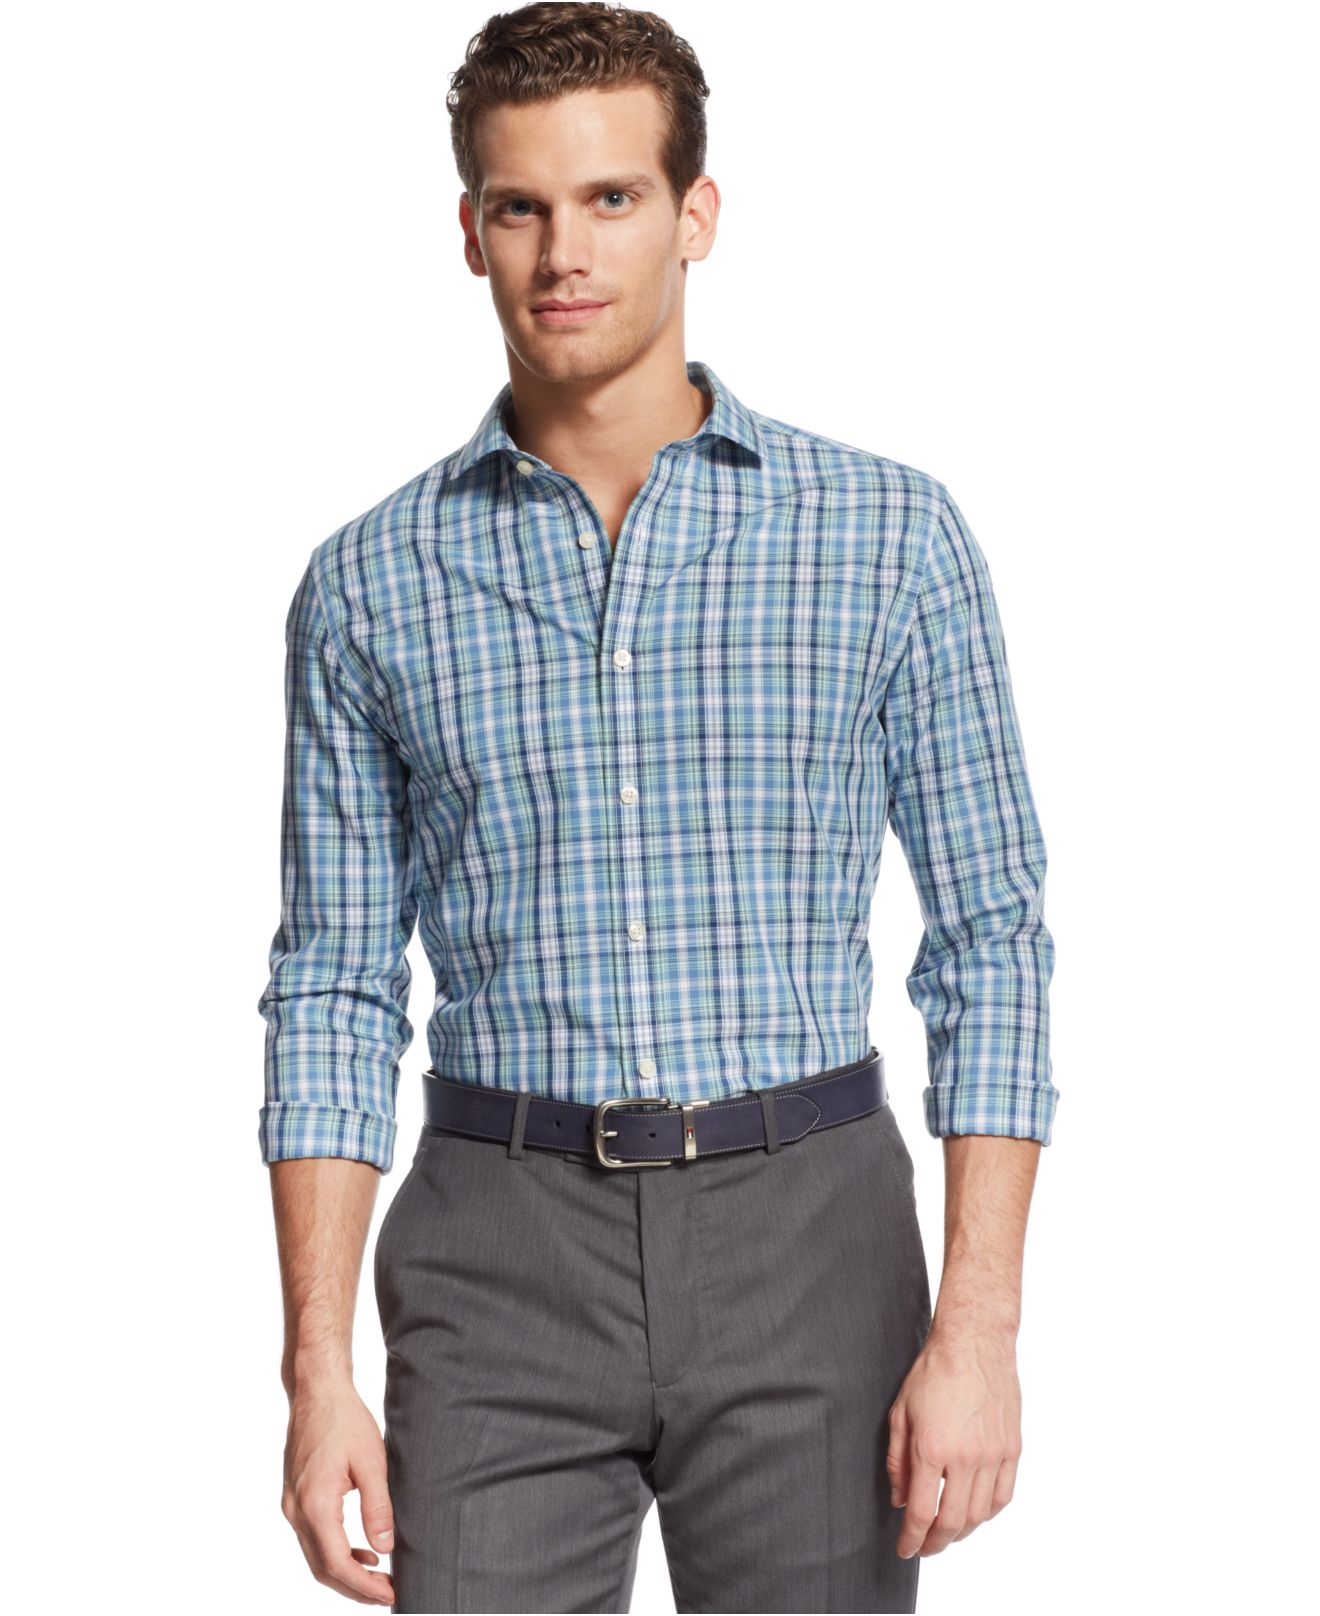 Tommy Hilfiger Non Iron Tumbleweed Plaid Custom Fit Shirt